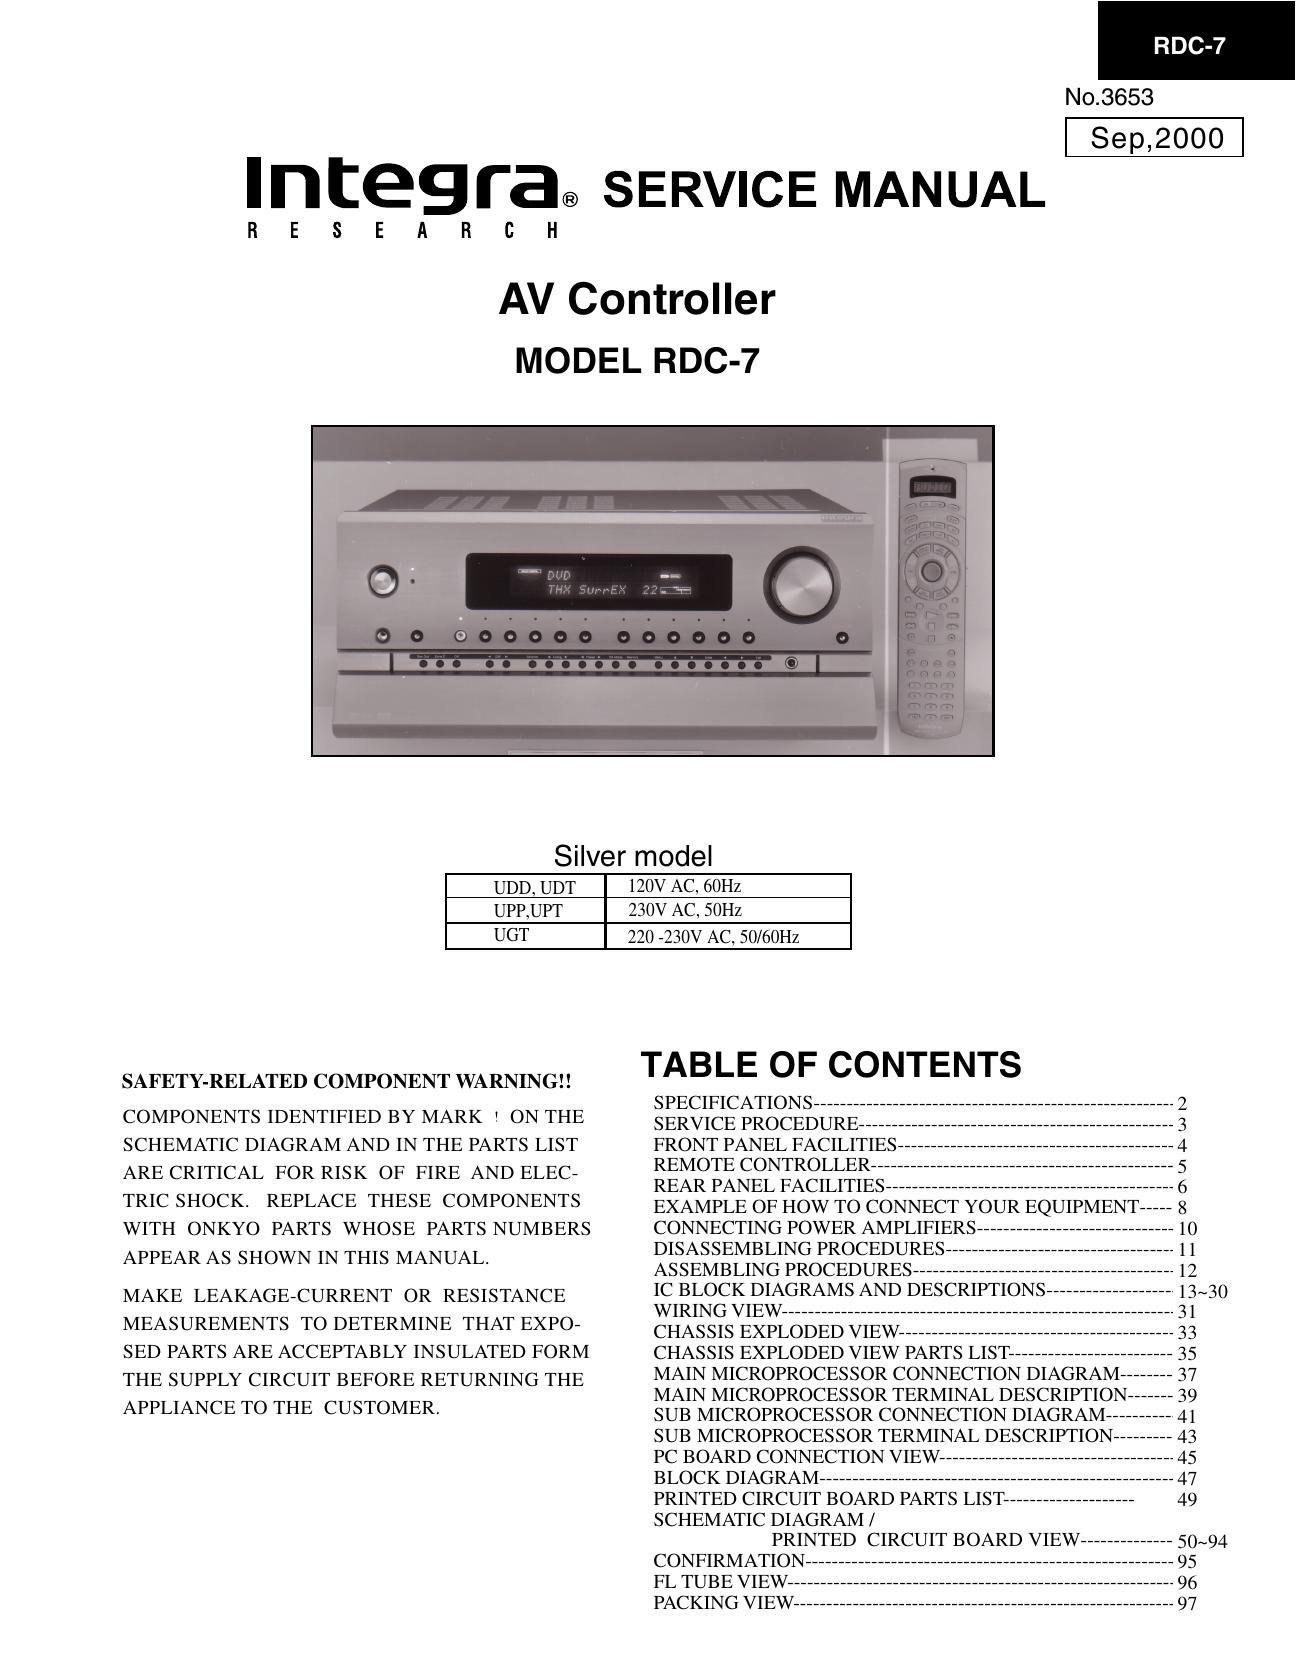 Onkyo Rdc 7 Service Manual Wiring Diagram